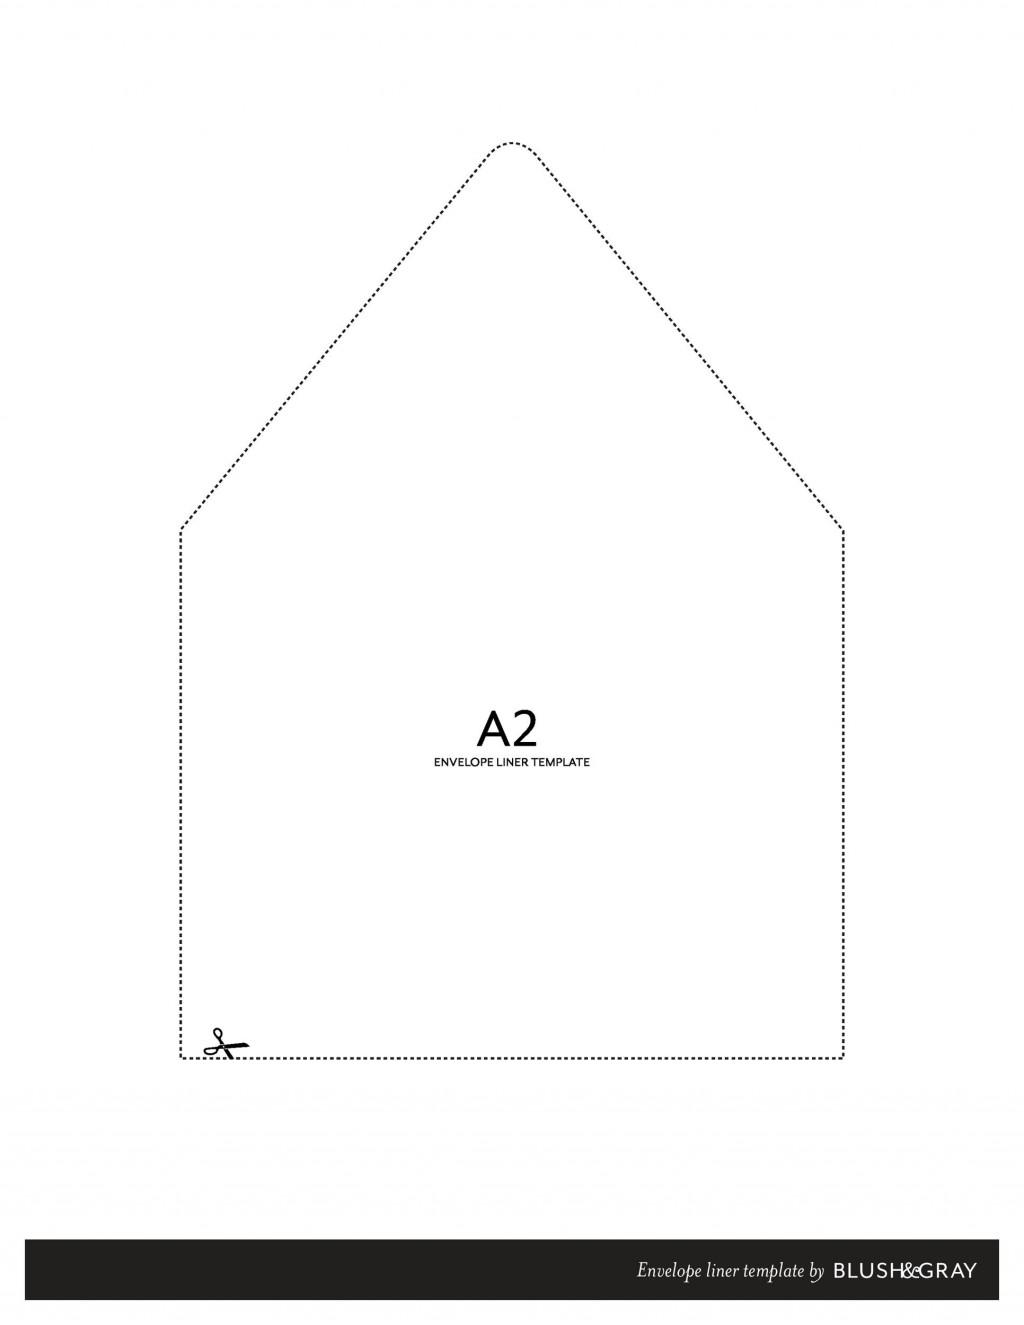 006 Awful 5x7 Envelope Template Word Sample  Microsoft FreeLarge